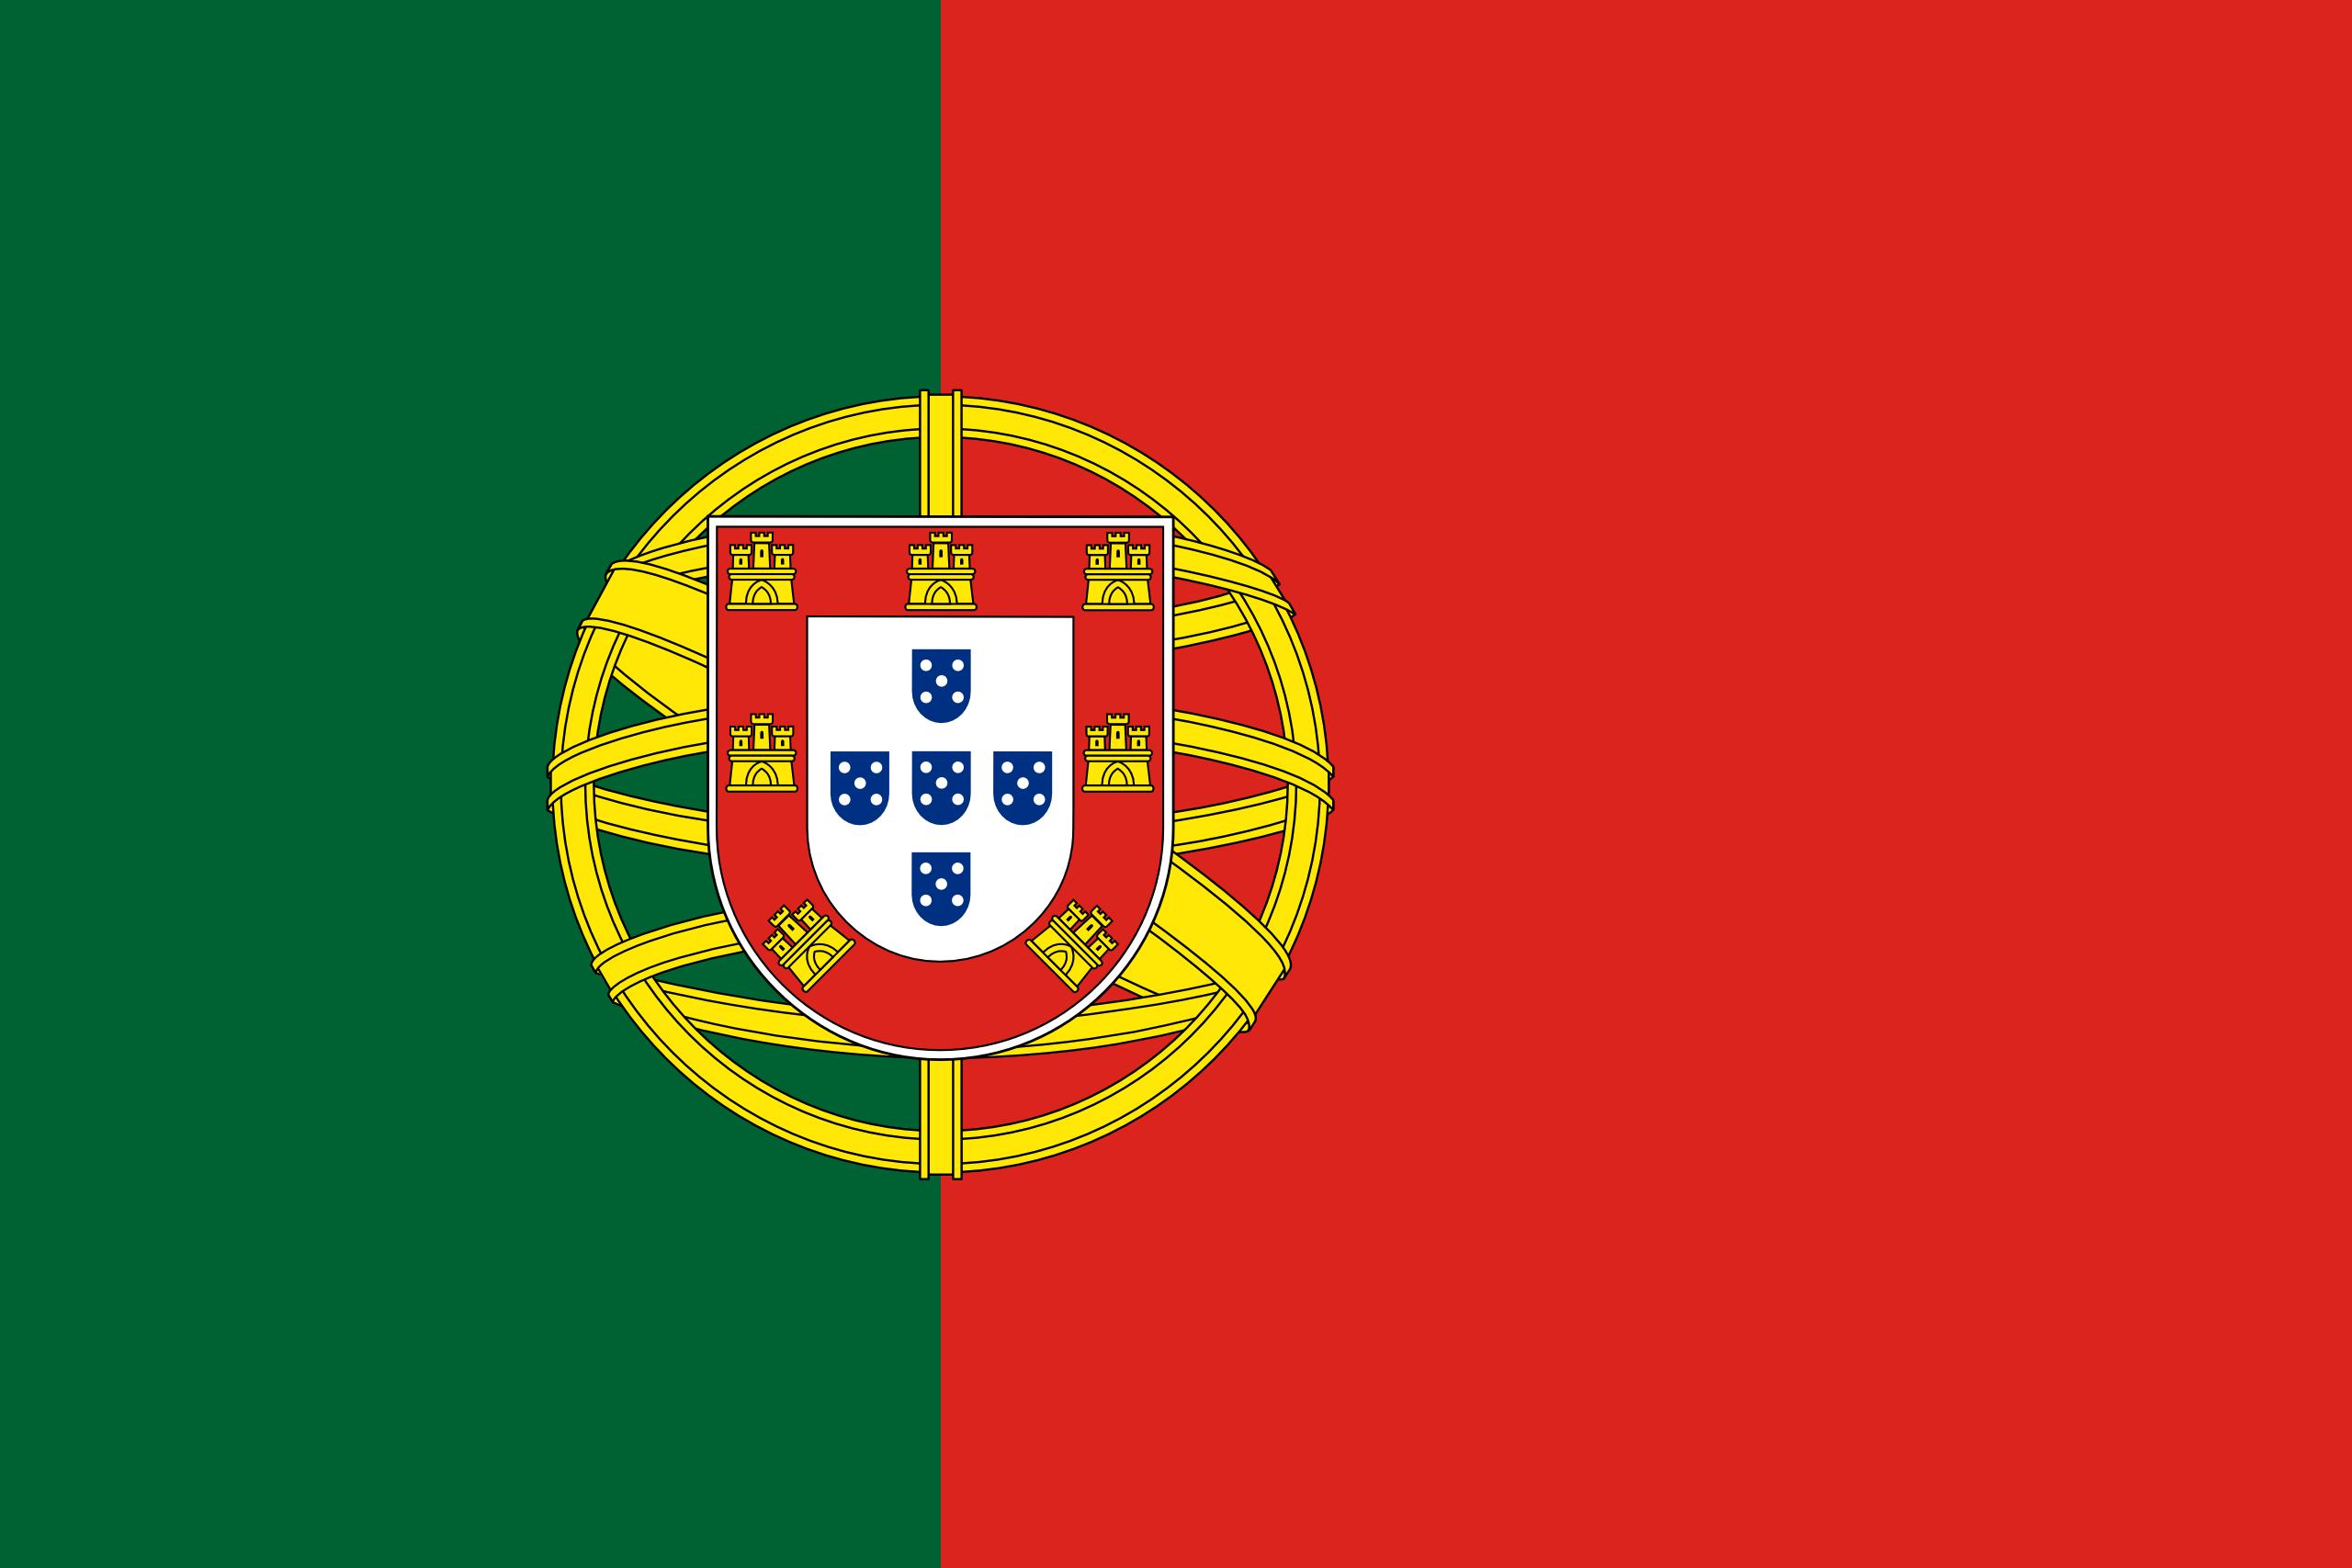 portugal, país, emblema, insignia, символ - Обои HD - Профессор falken.com